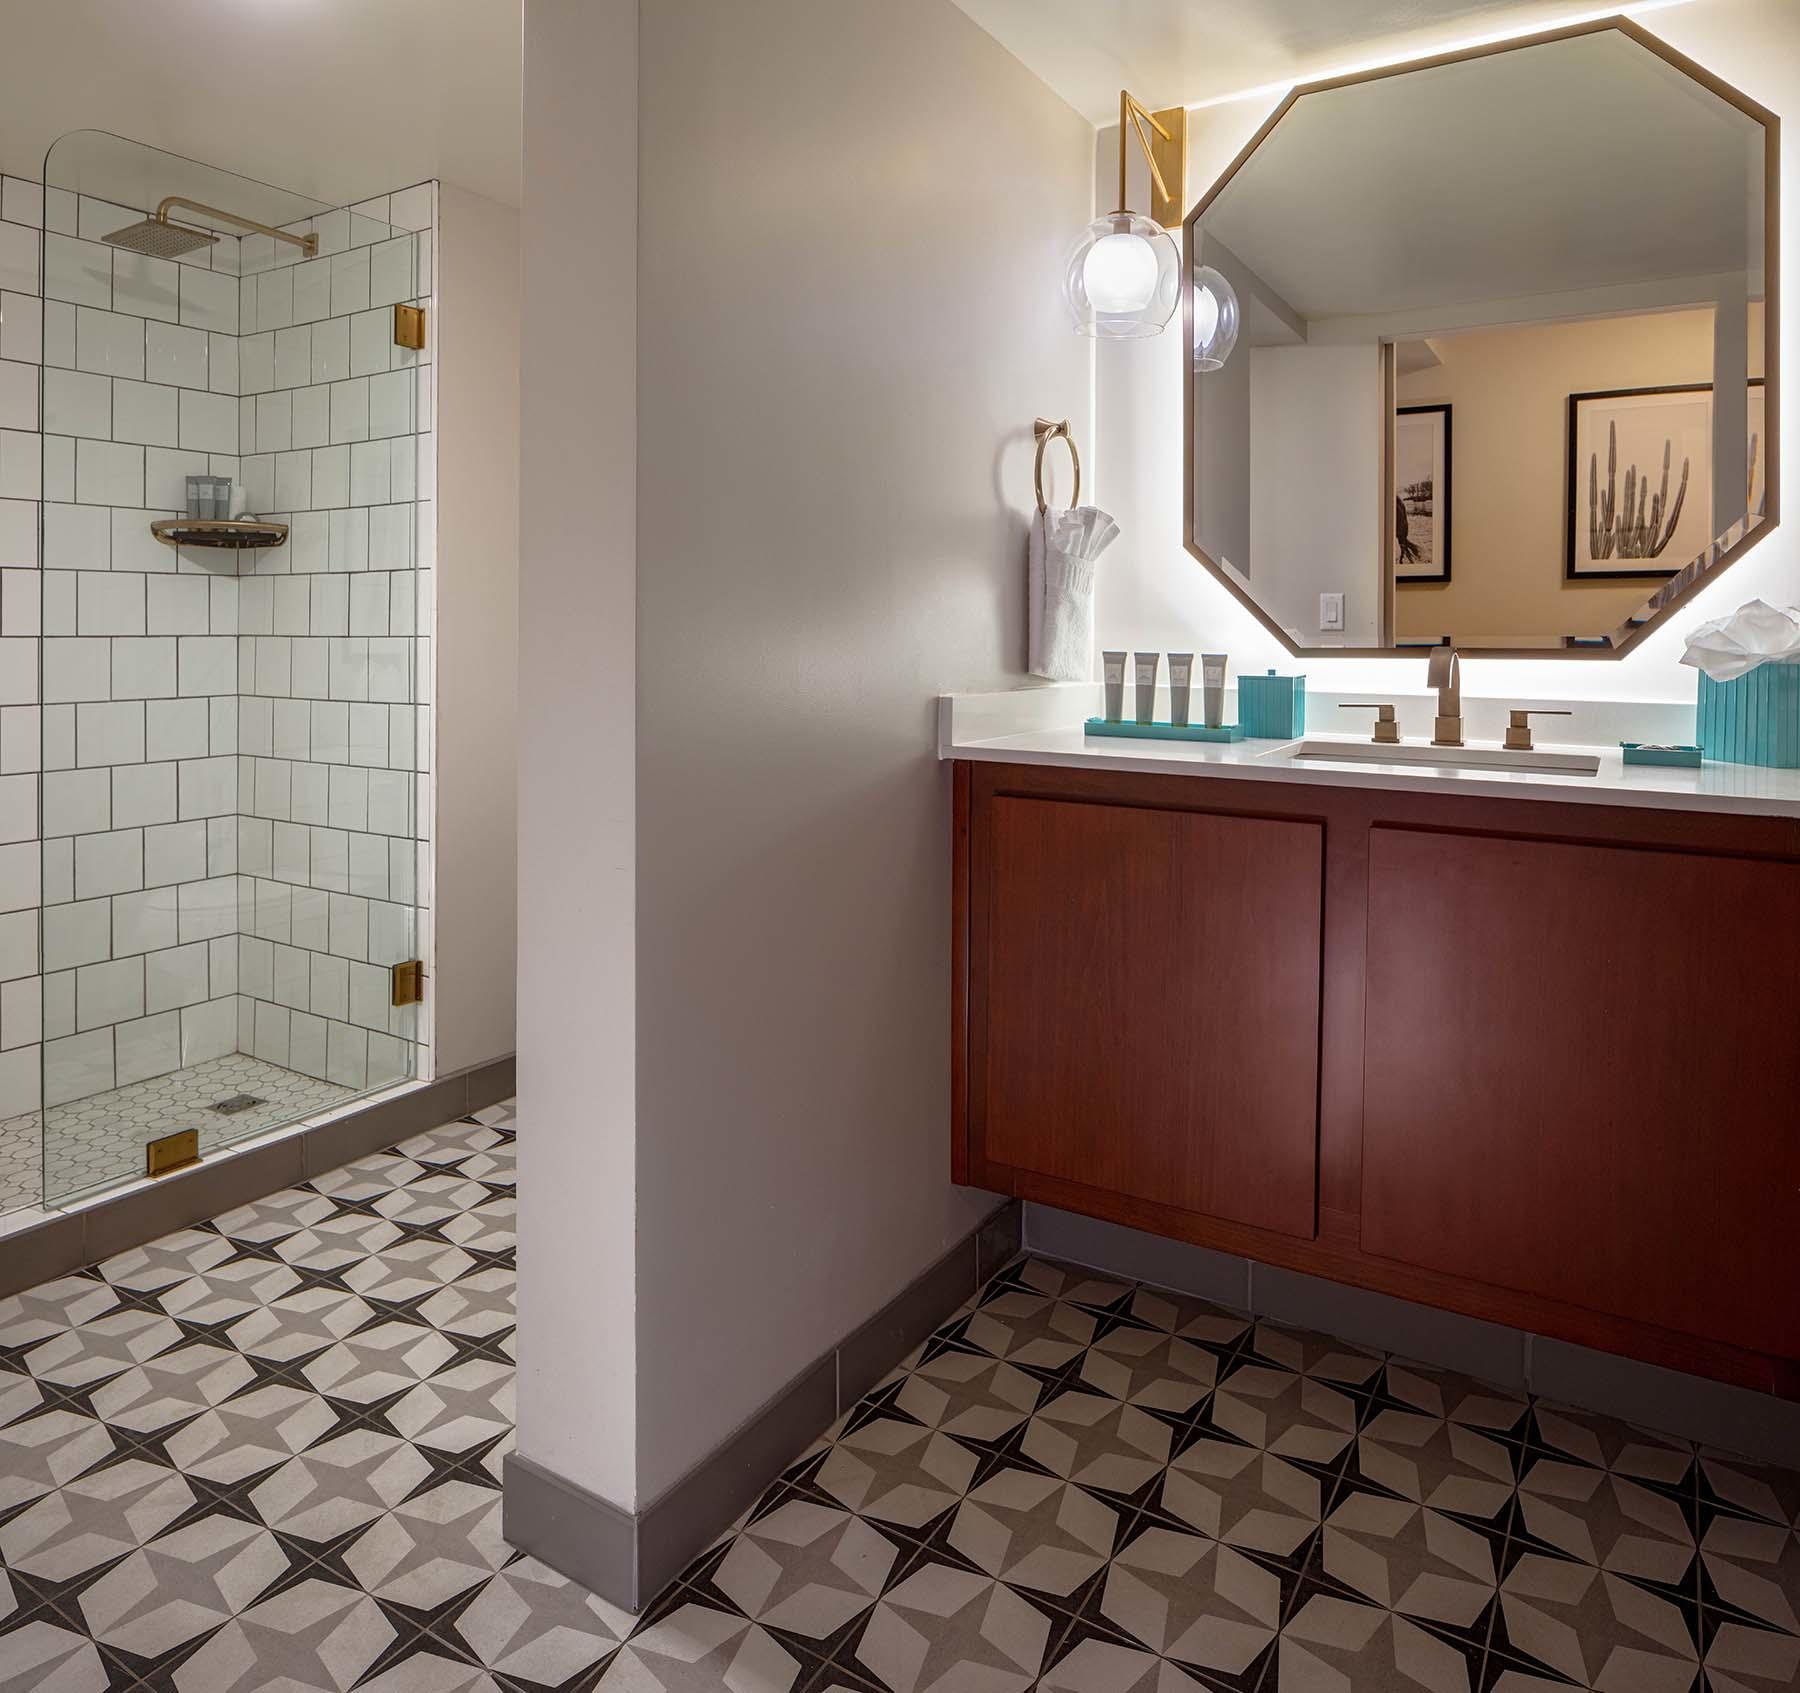 Hotel Adeline image 32